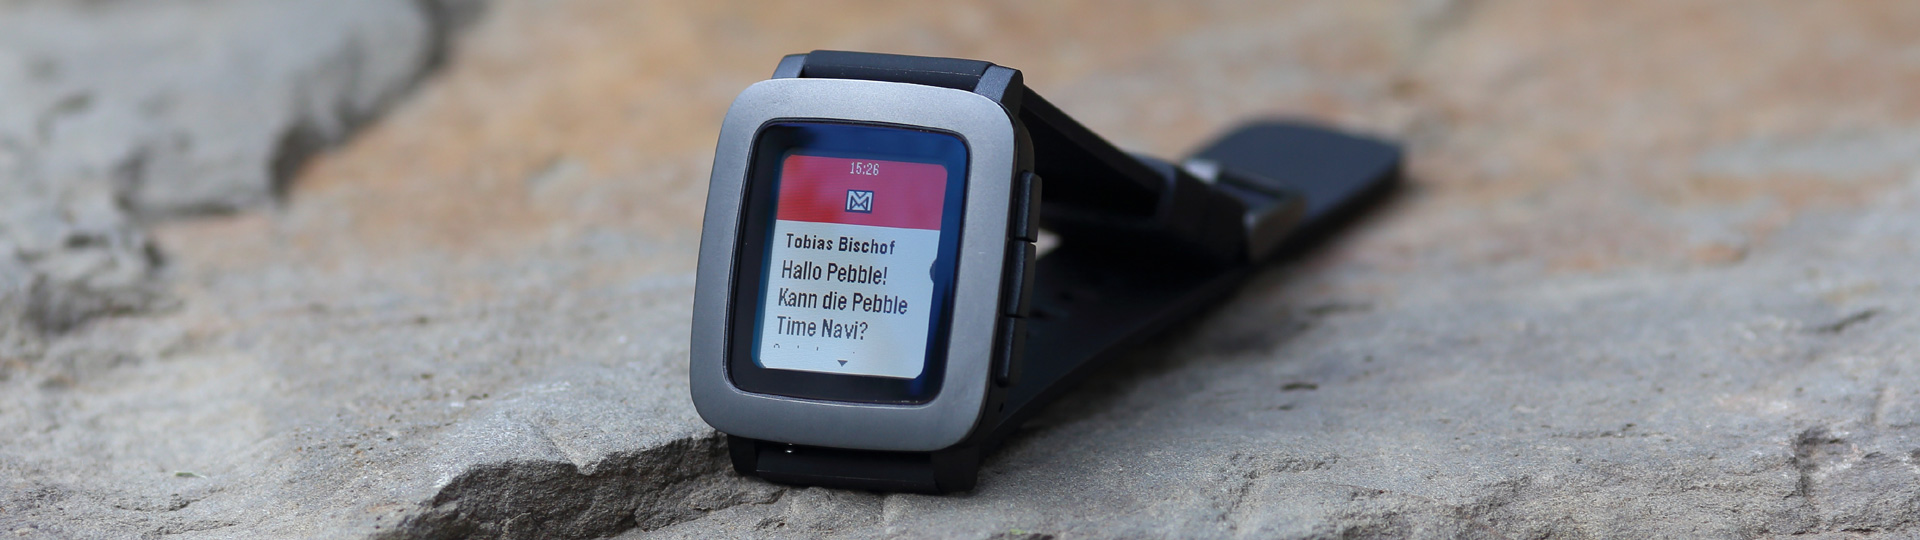 pebble_time_navi_small